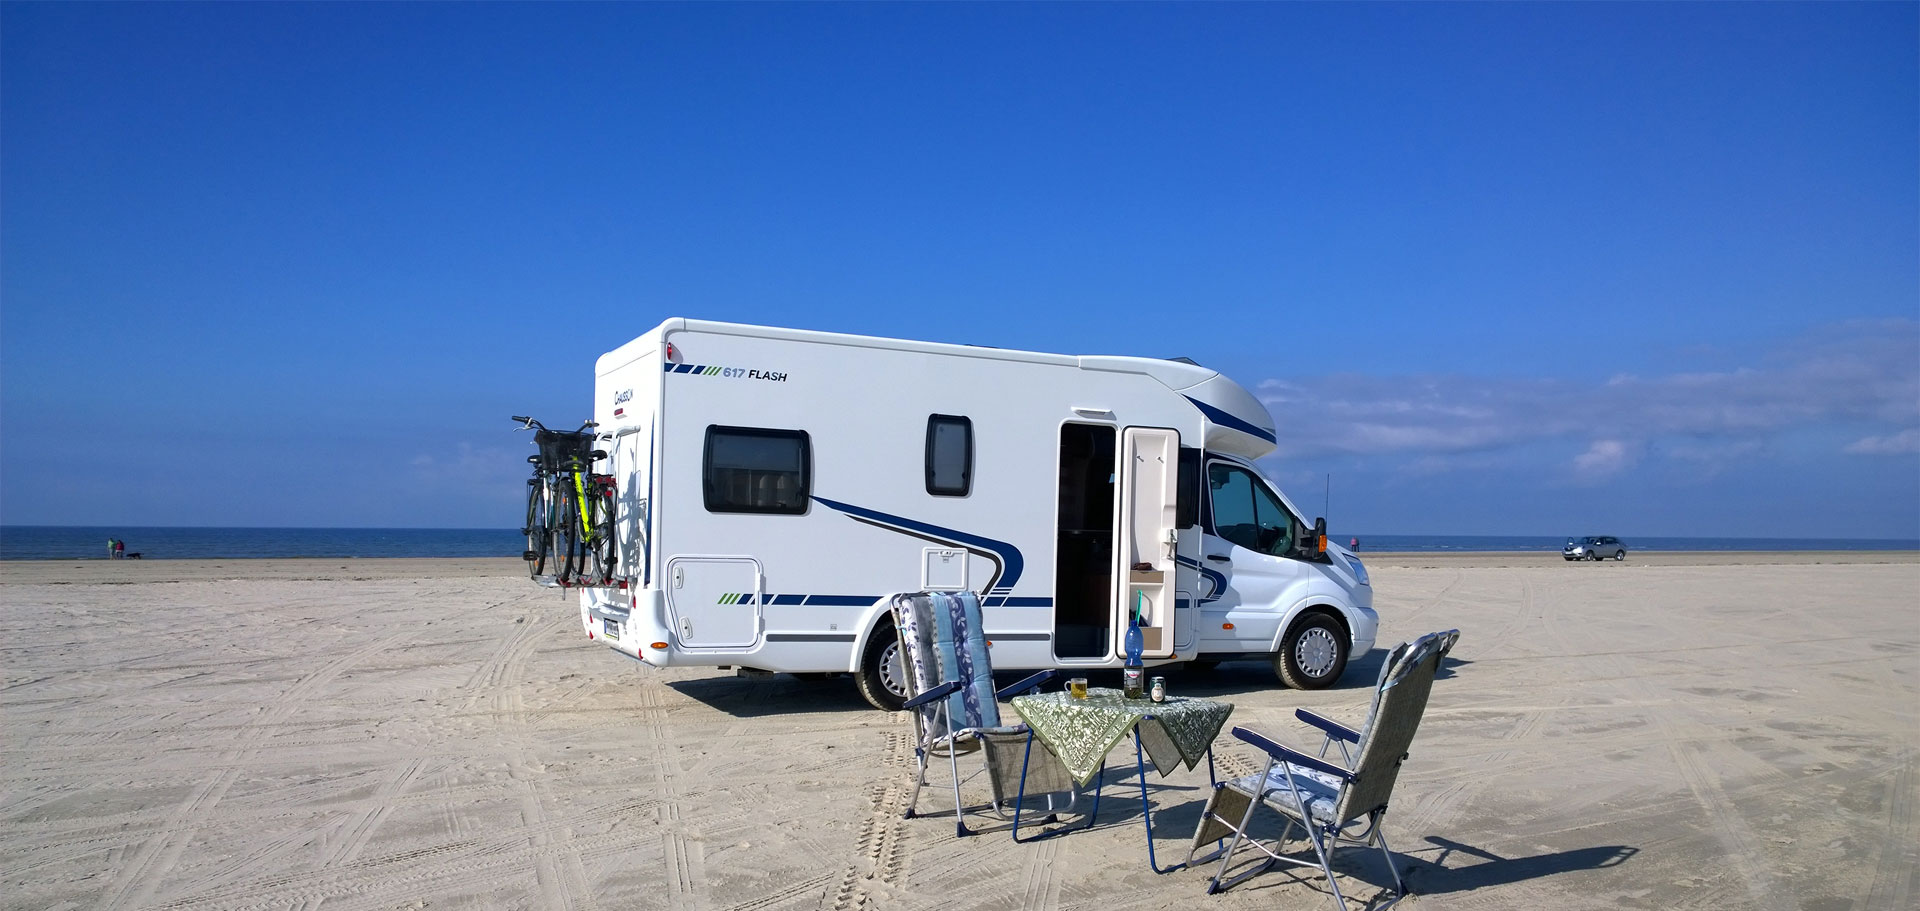 Ongebruikt Nuthetal Caravan GmbH - Wohnmobile, Wohnwagen, Reisemobile kaufen GQ-77